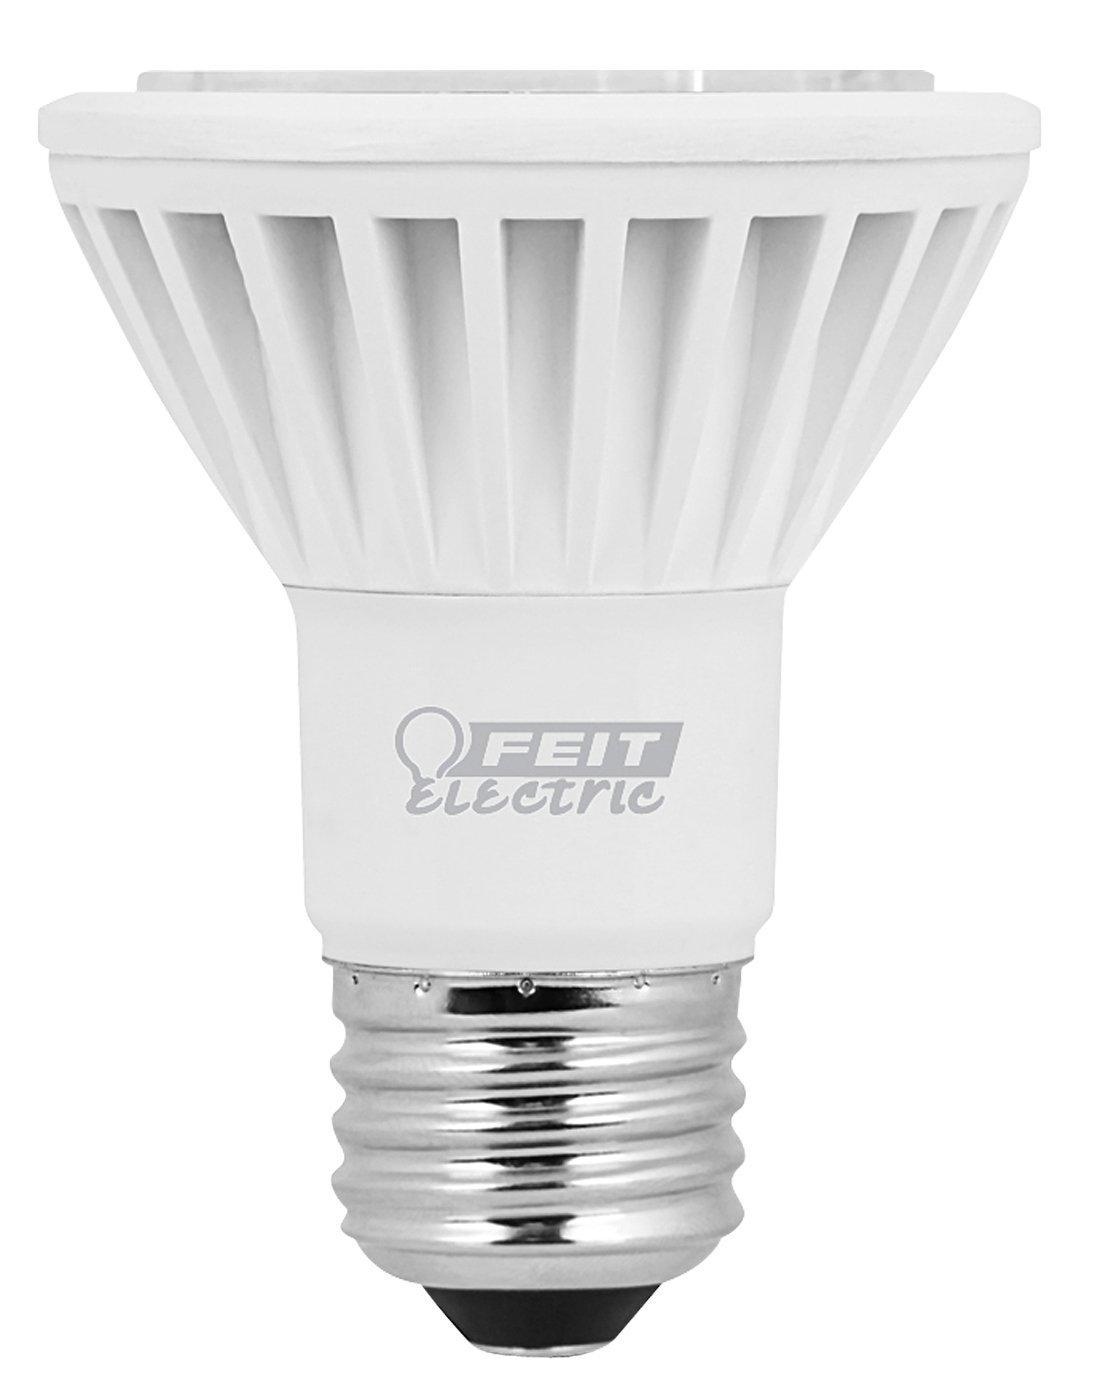 Feit Electric Dimmable 50 Watt Equivalent PAR20 LED Reflector - Led Household Light Bulbs - Amazon.com  sc 1 st  Amazon.com & Feit Electric Dimmable 50 Watt Equivalent PAR20 LED Reflector ... azcodes.com